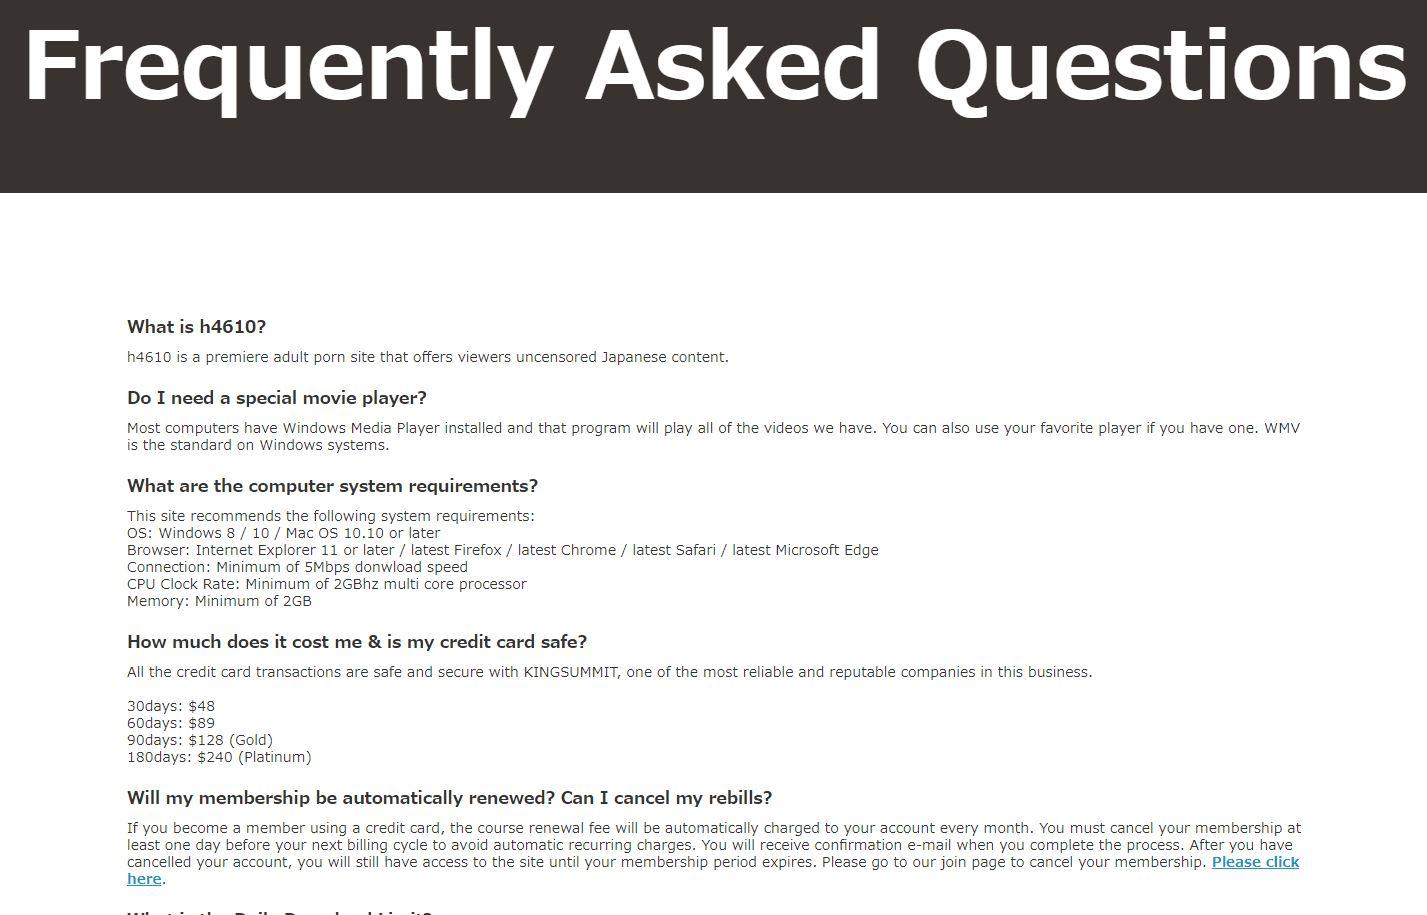 FAQ page on H4610